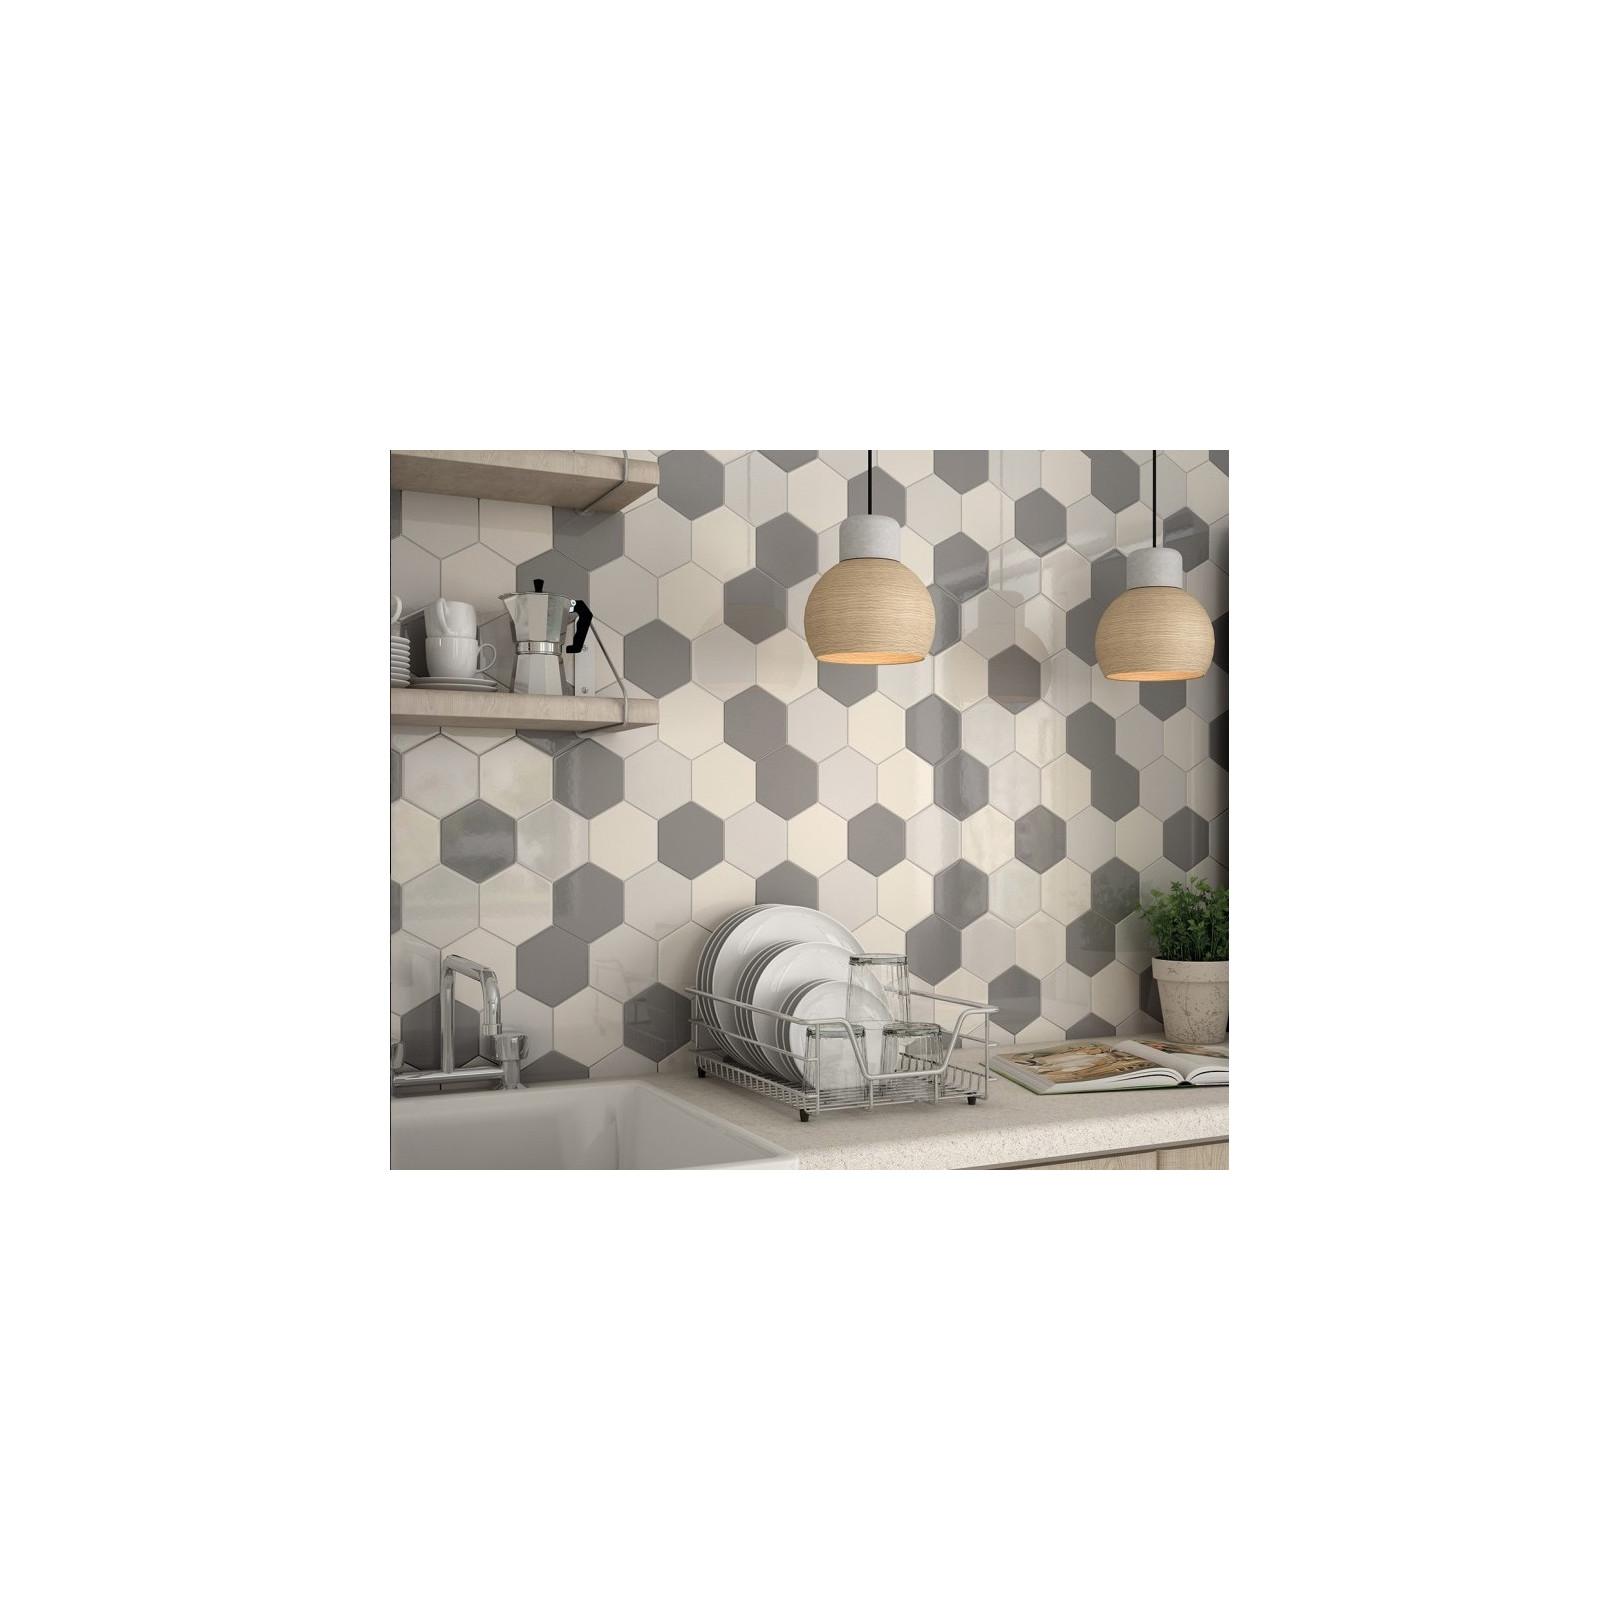 carrelage mural faience scale hexagon 10 couleurs hexagone 12 4x10 7cm casalux home design